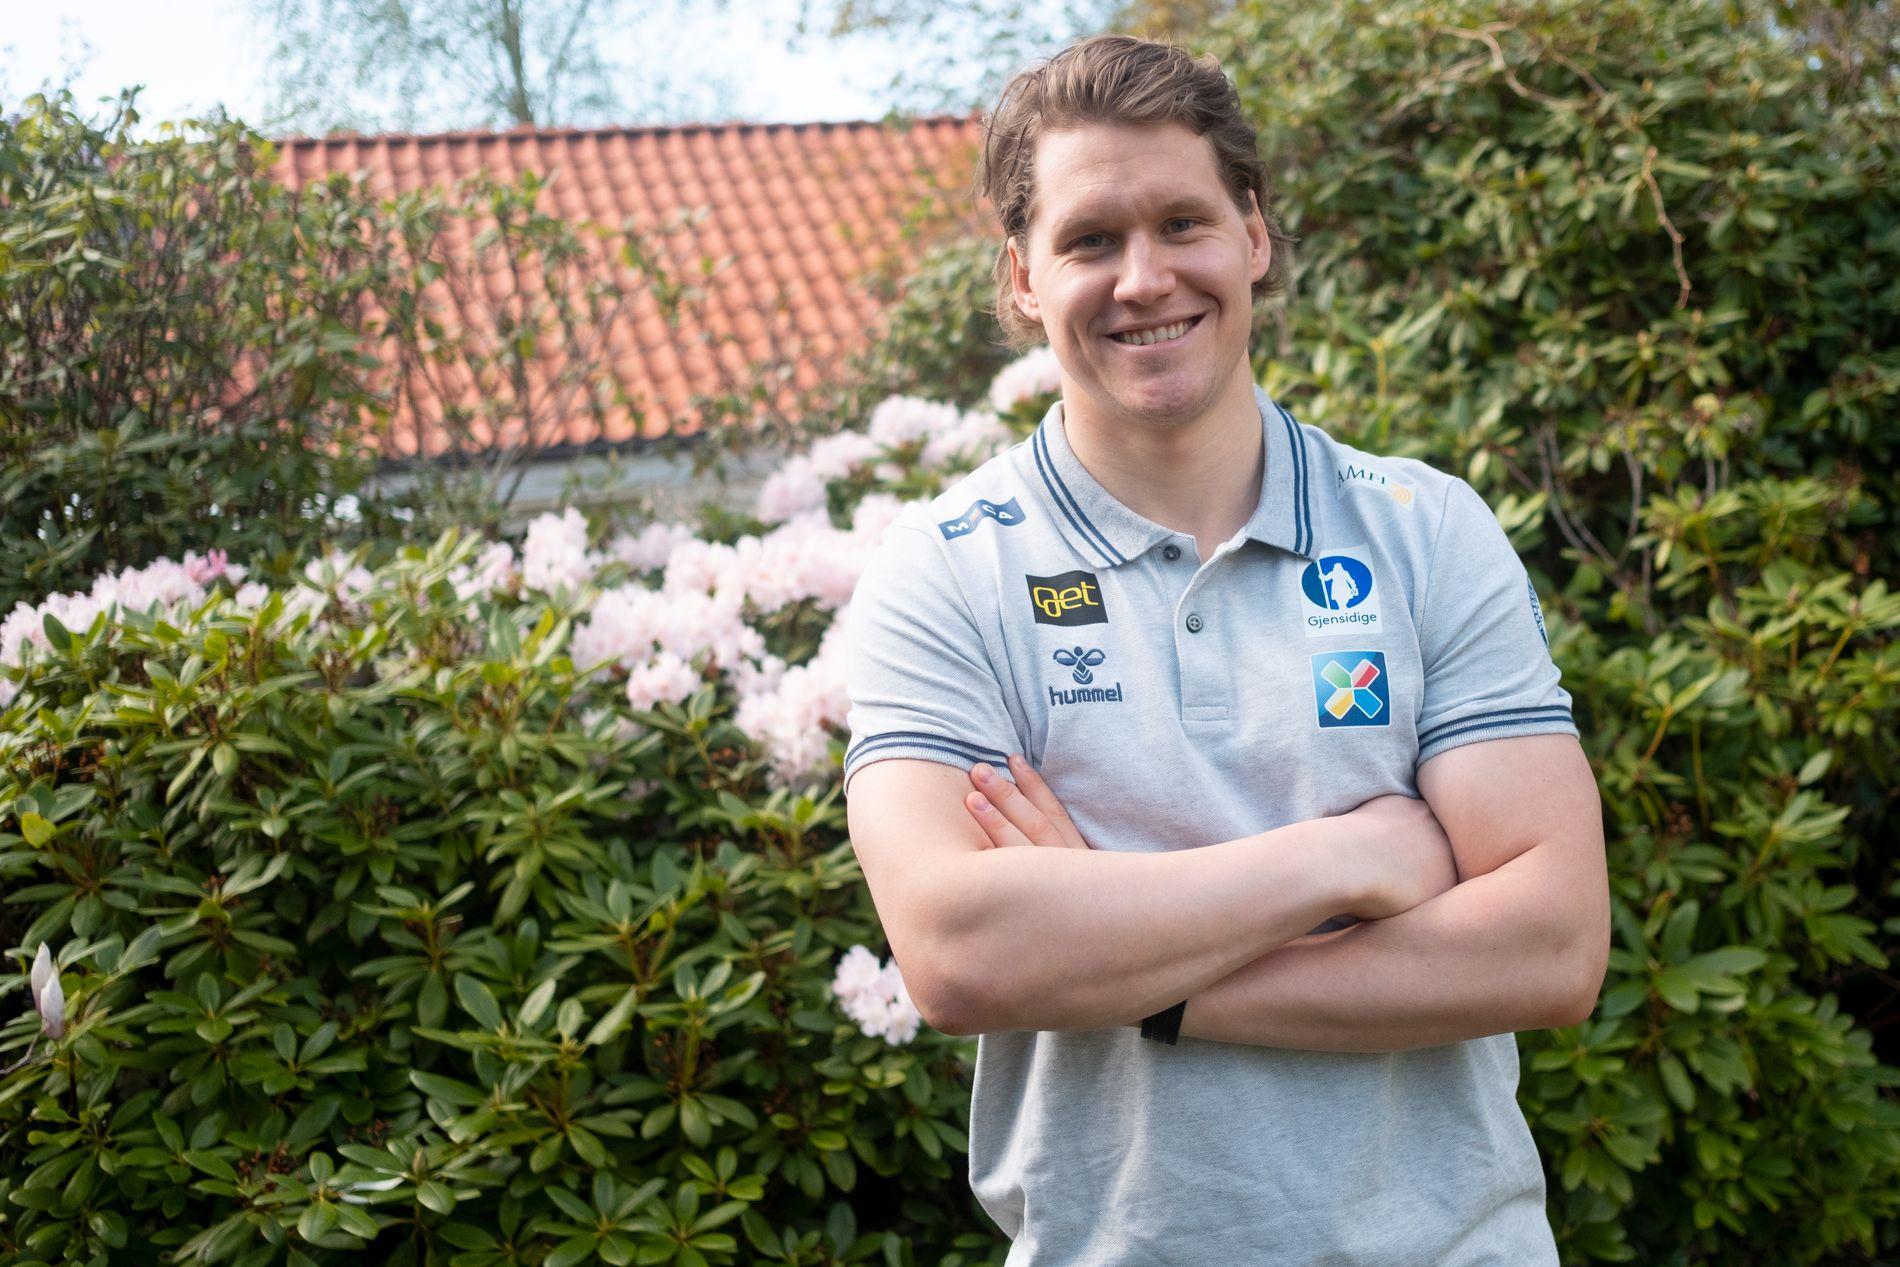 OL-TOPPSCORER: Alexander Bonsaksen scoret to mål i Pyeongchang. I VM i Herning har han scoret en gang for Norge.